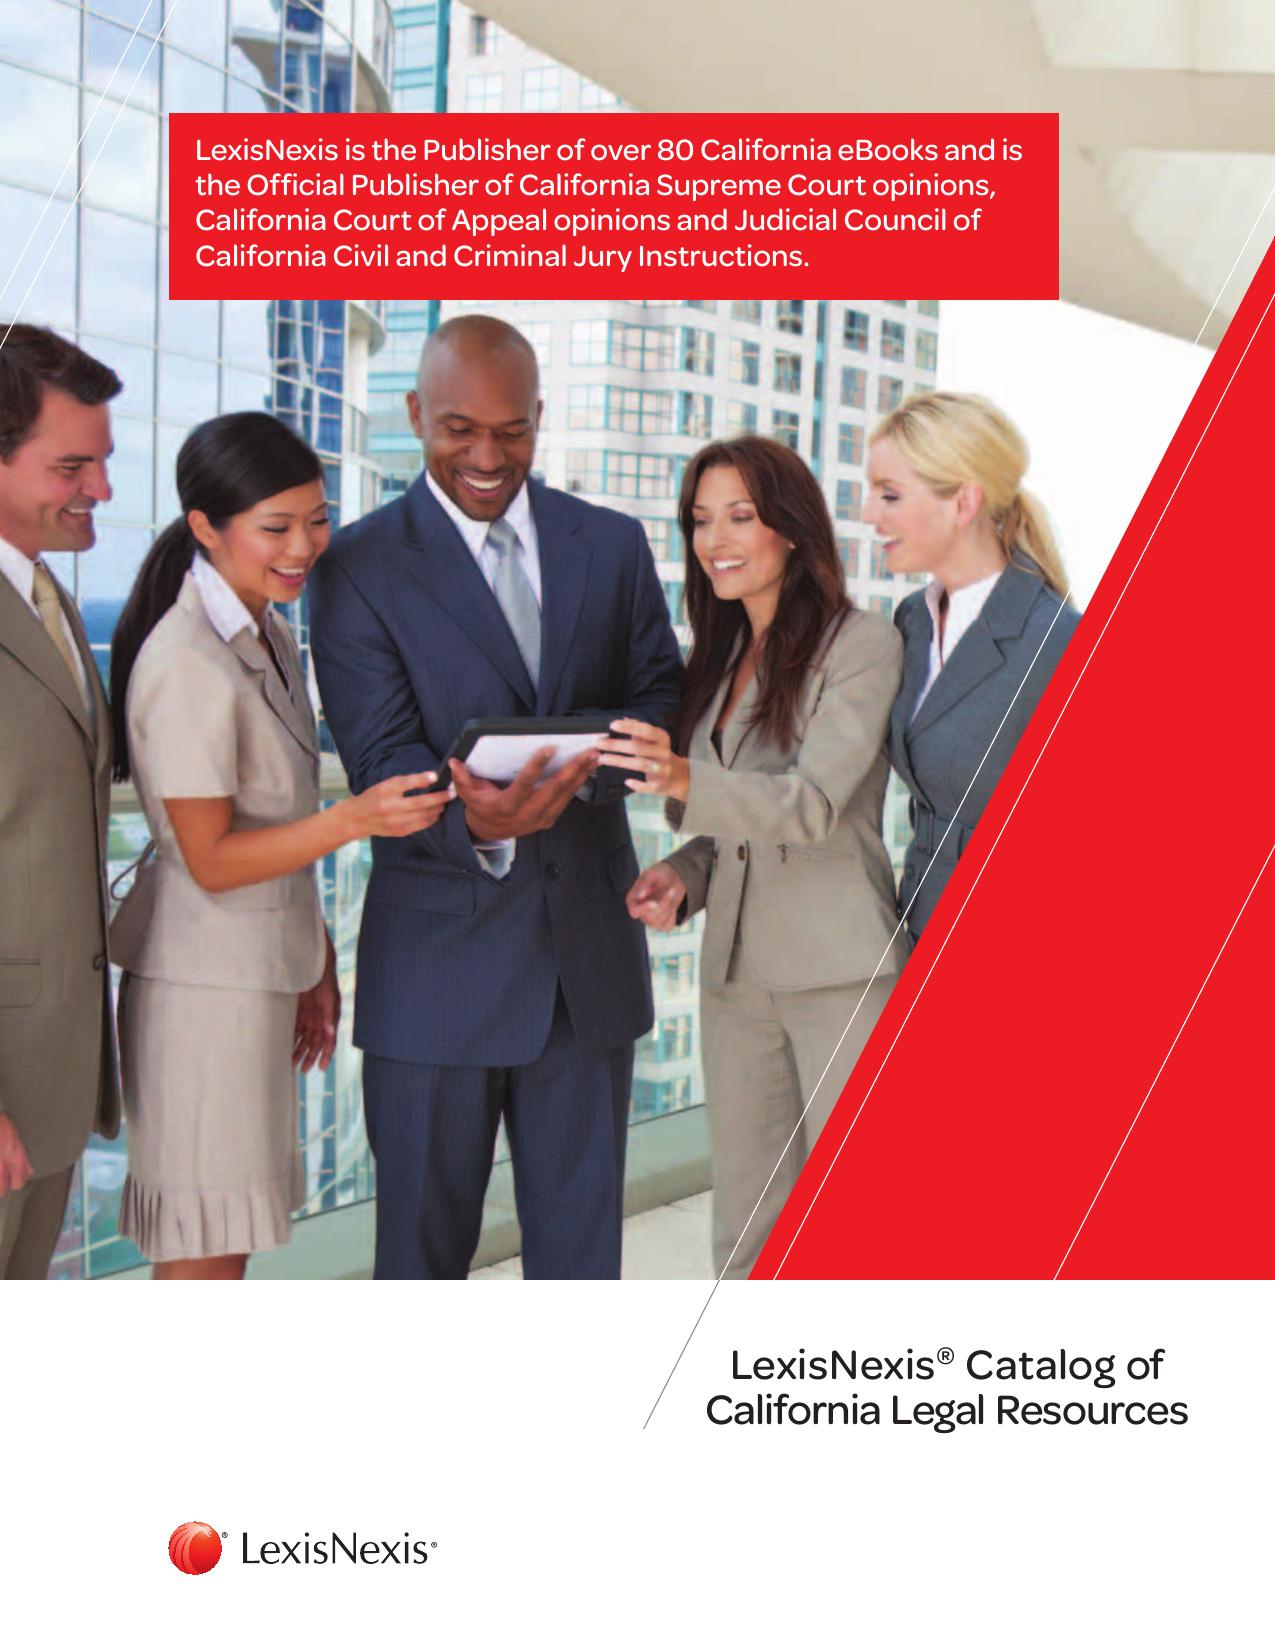 Lexisnexis Catalog Of California Legal Resources